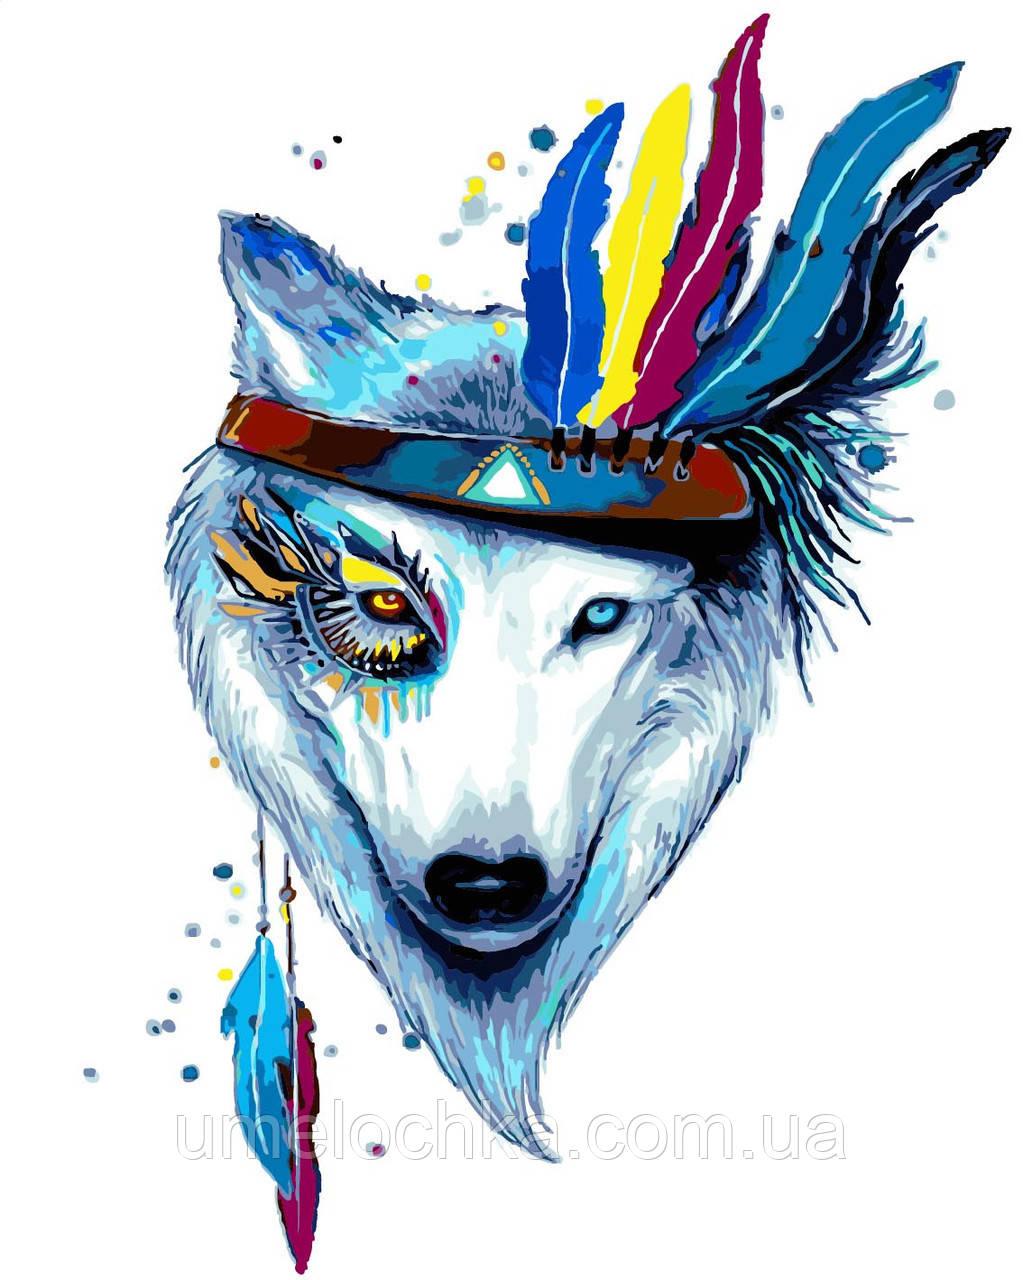 Картина по номерам без коробки Идейка Белая волчица (KHO4019) 40 х 50 см